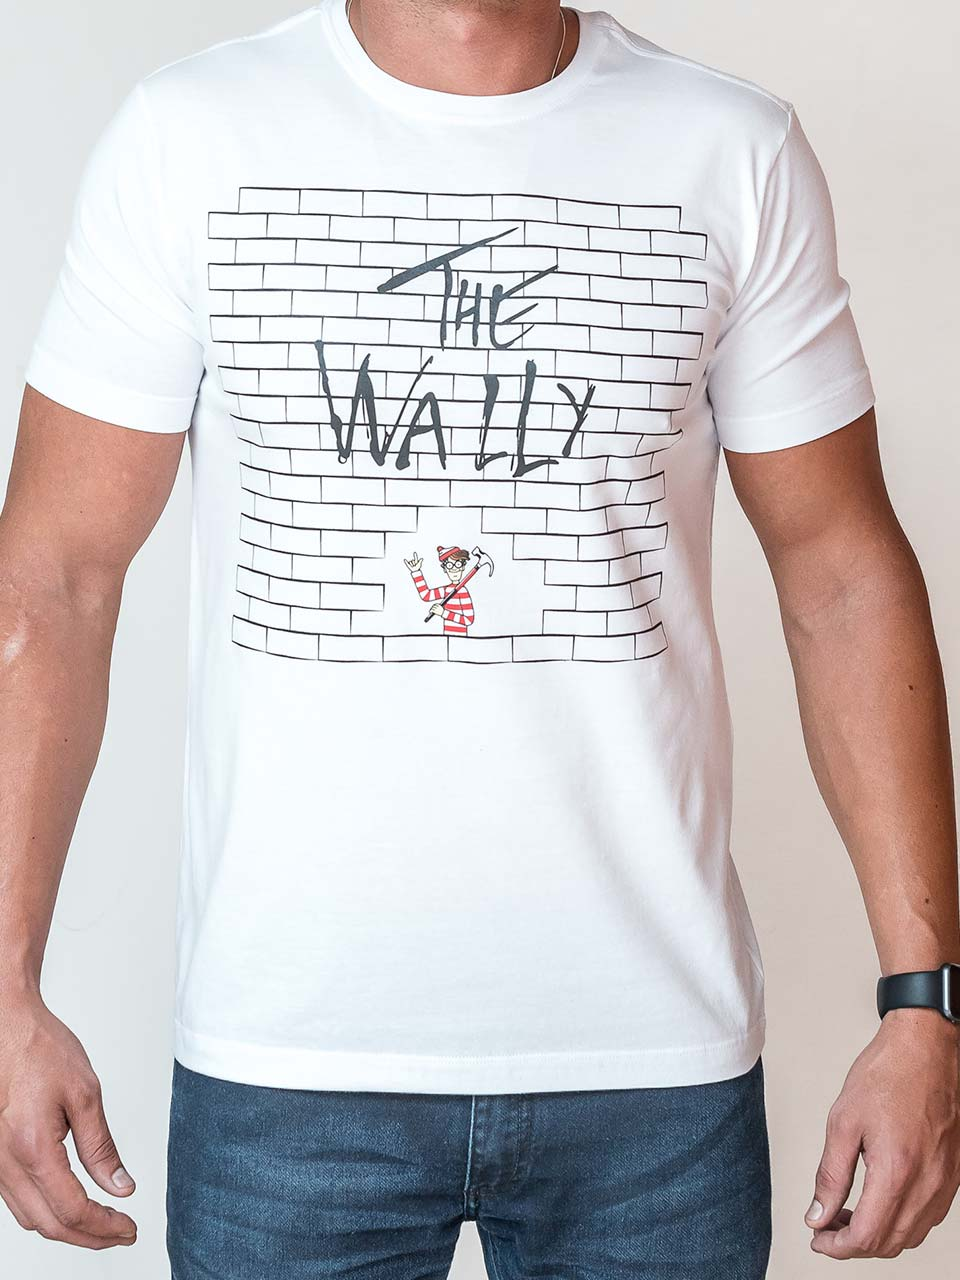 Camiseta Capote The Wally